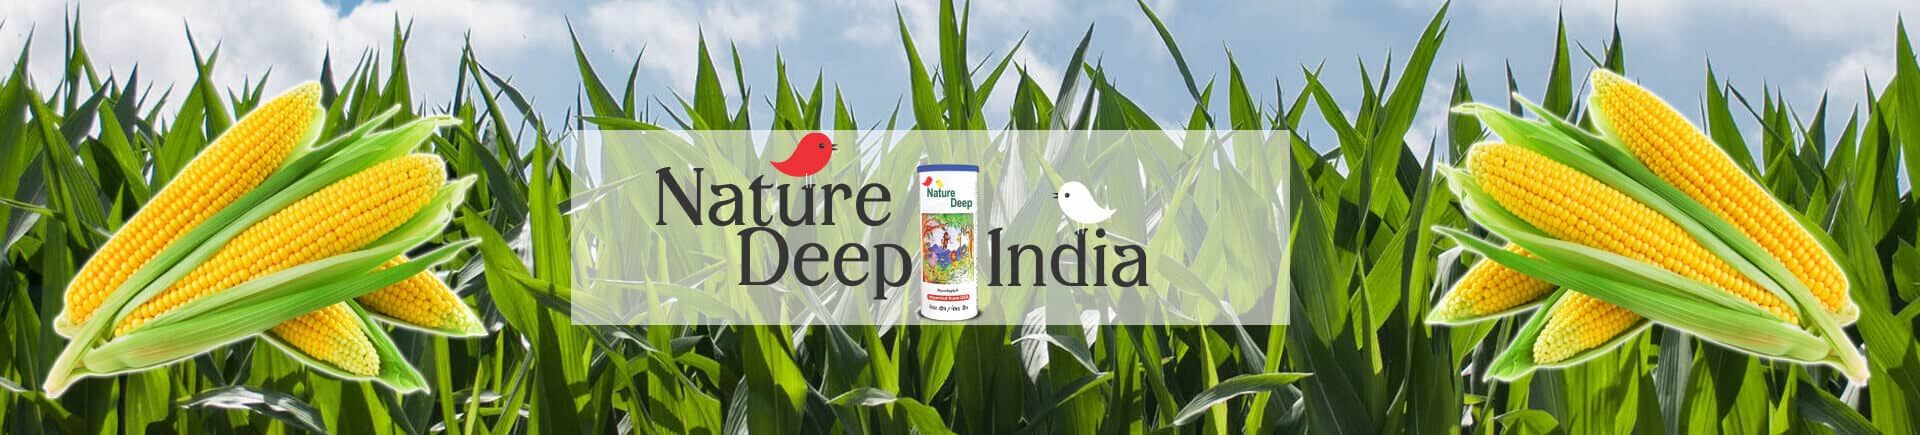 sumitomo naturedeep for corn crop desktop banner